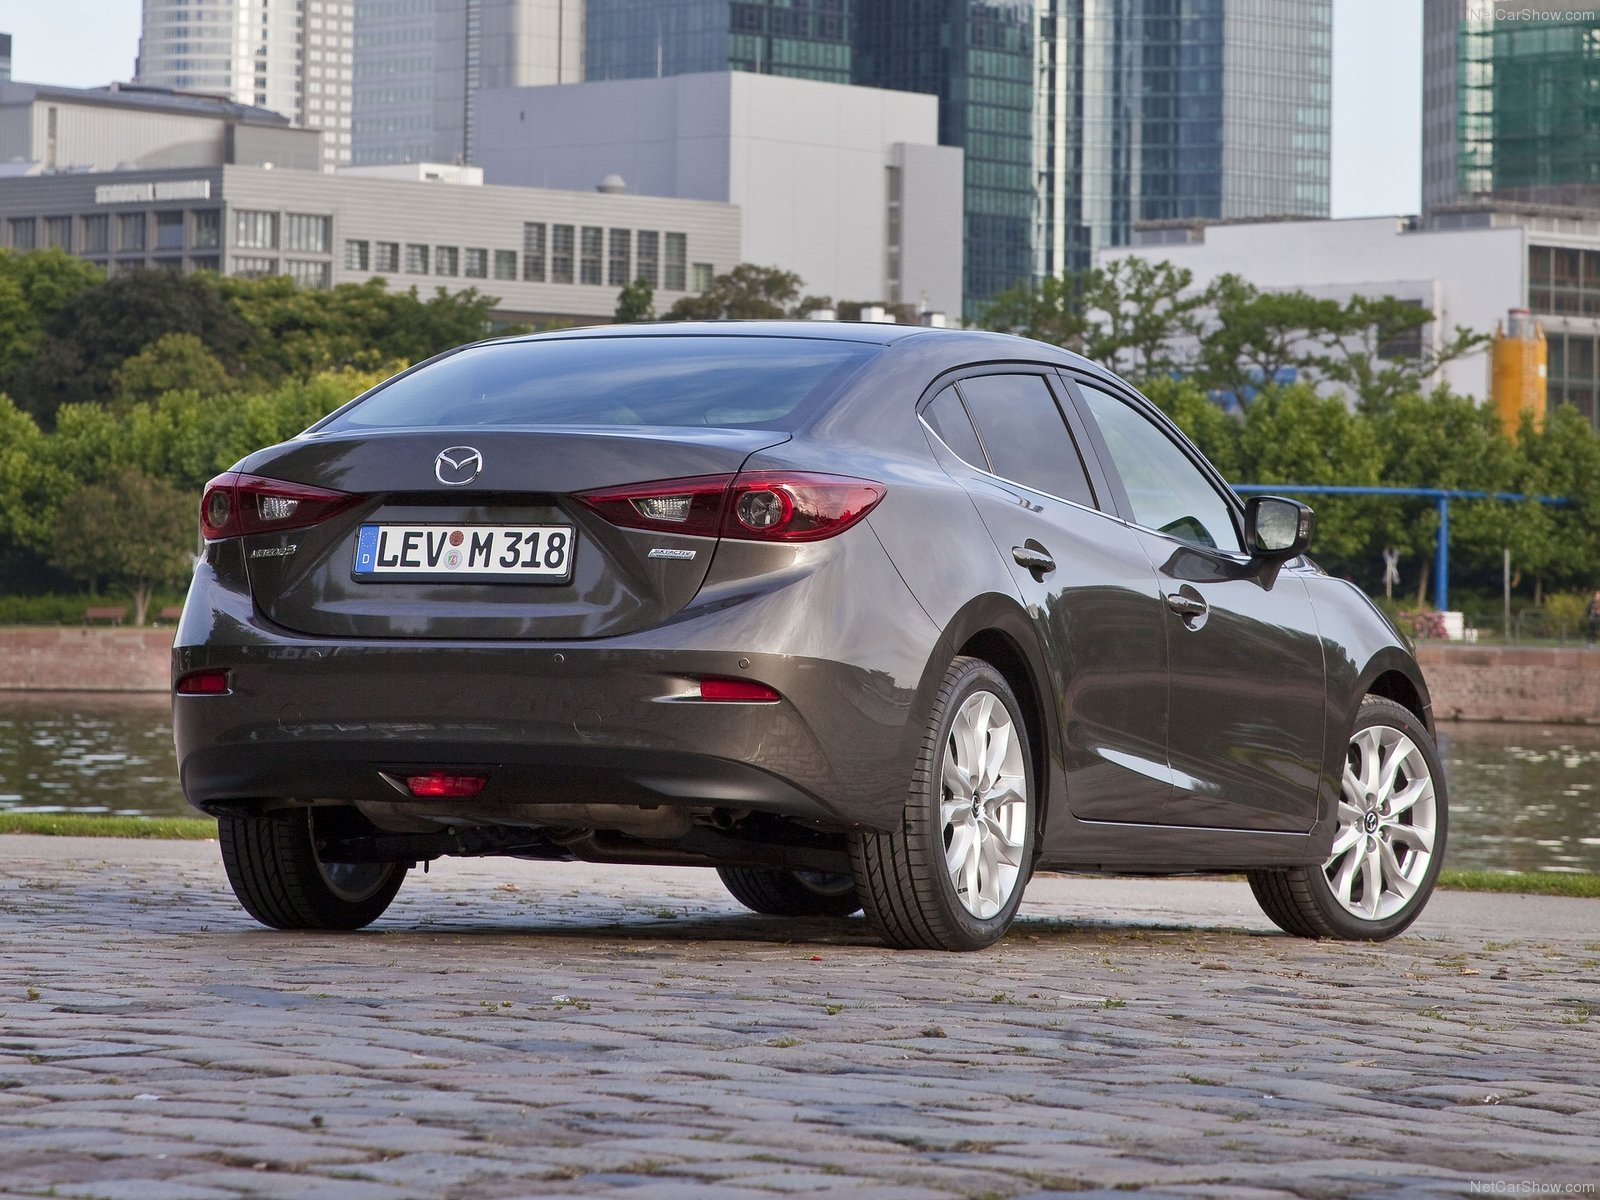 Mazda-3_Sedan_2014_1600x1200_wallpaper_21.jpg